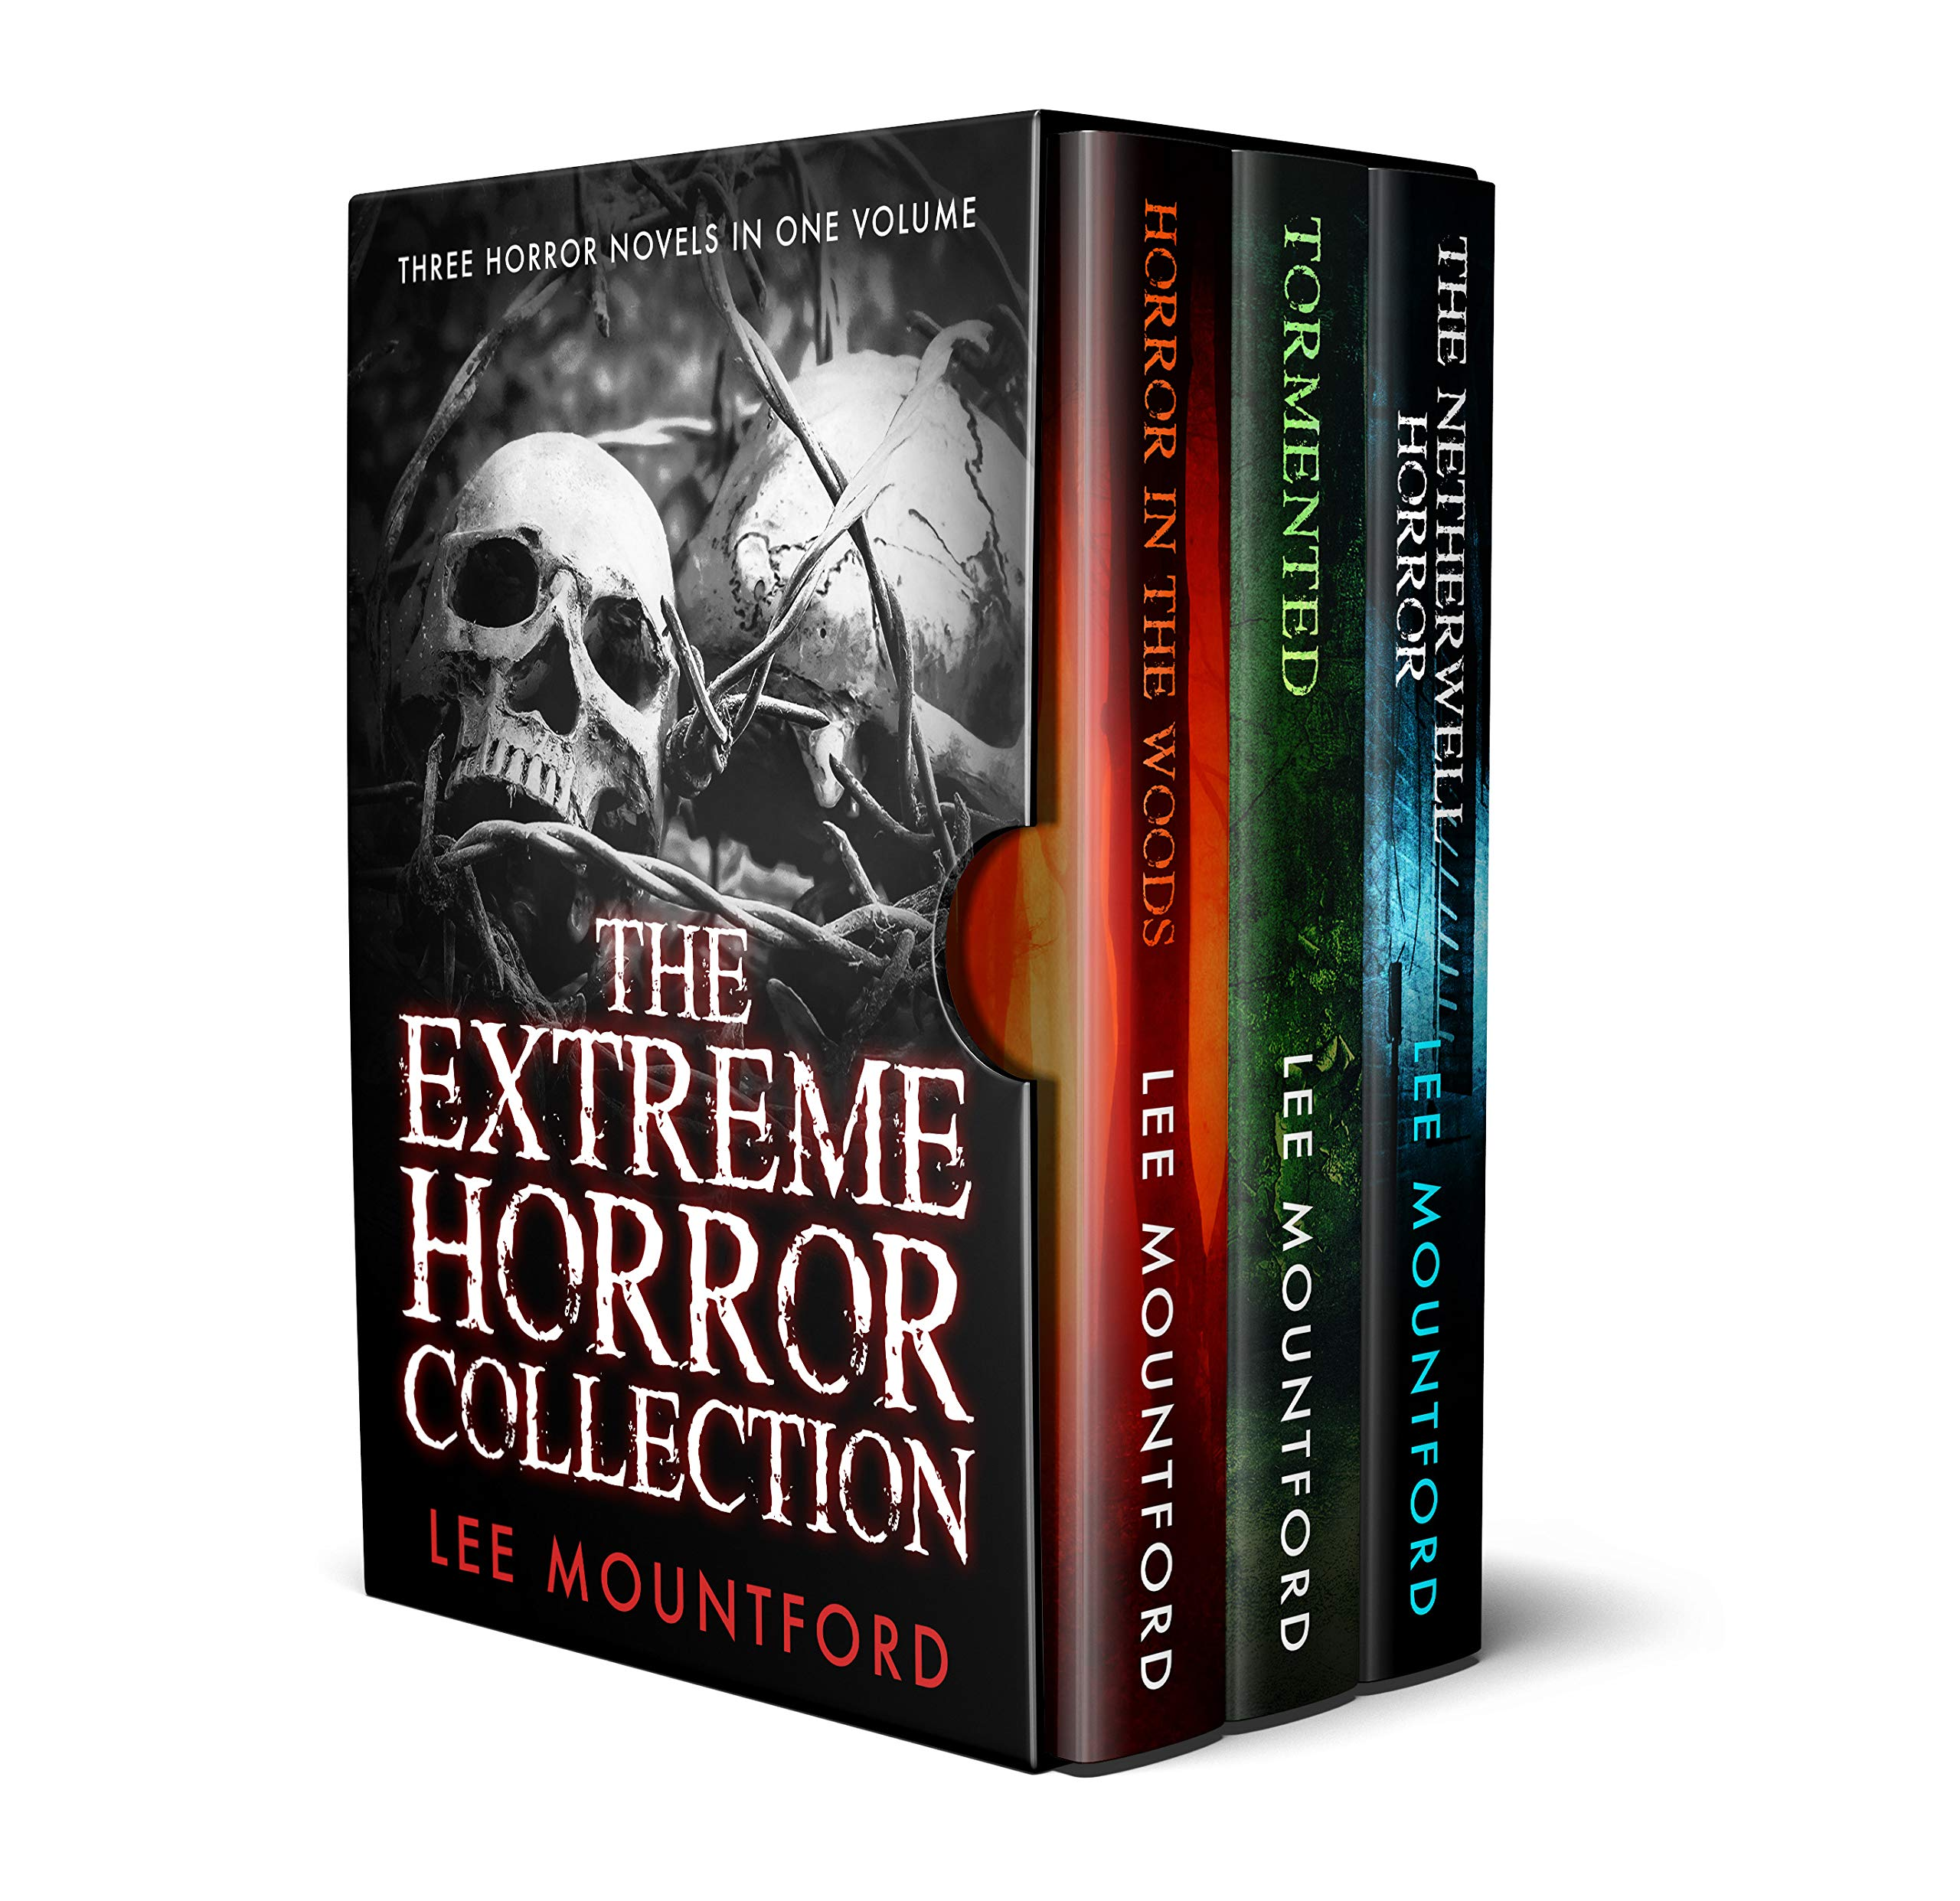 The Extreme Horror Collection: Three Novel Box Set